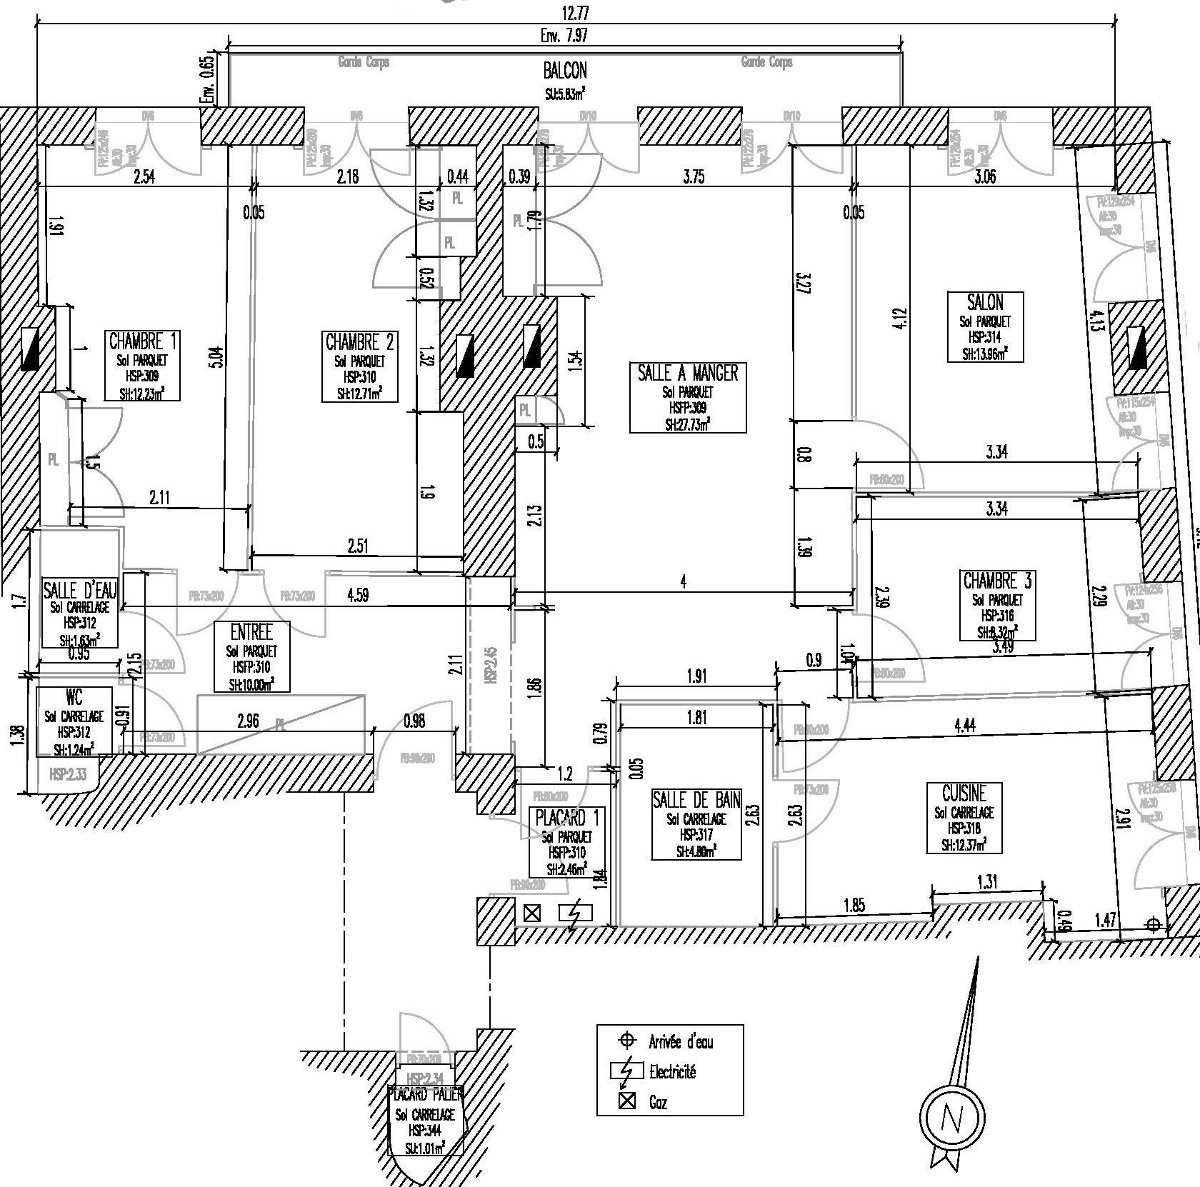 SCAL plan architecture relevé Lyon Villeurbanne